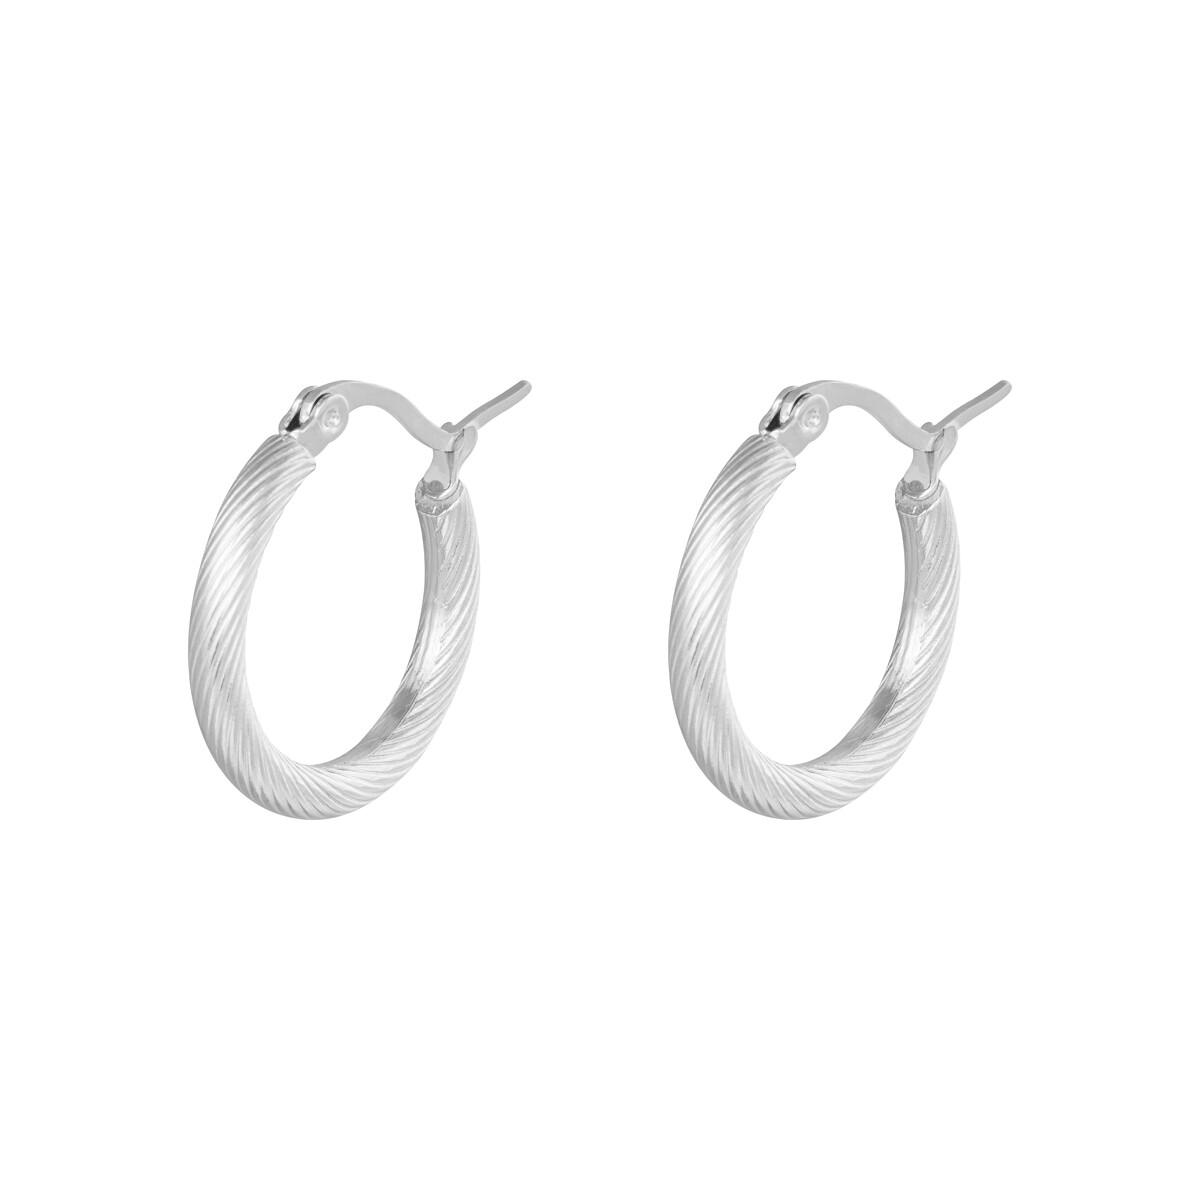 Twist oorringetjes zilver 22mm stainless steel